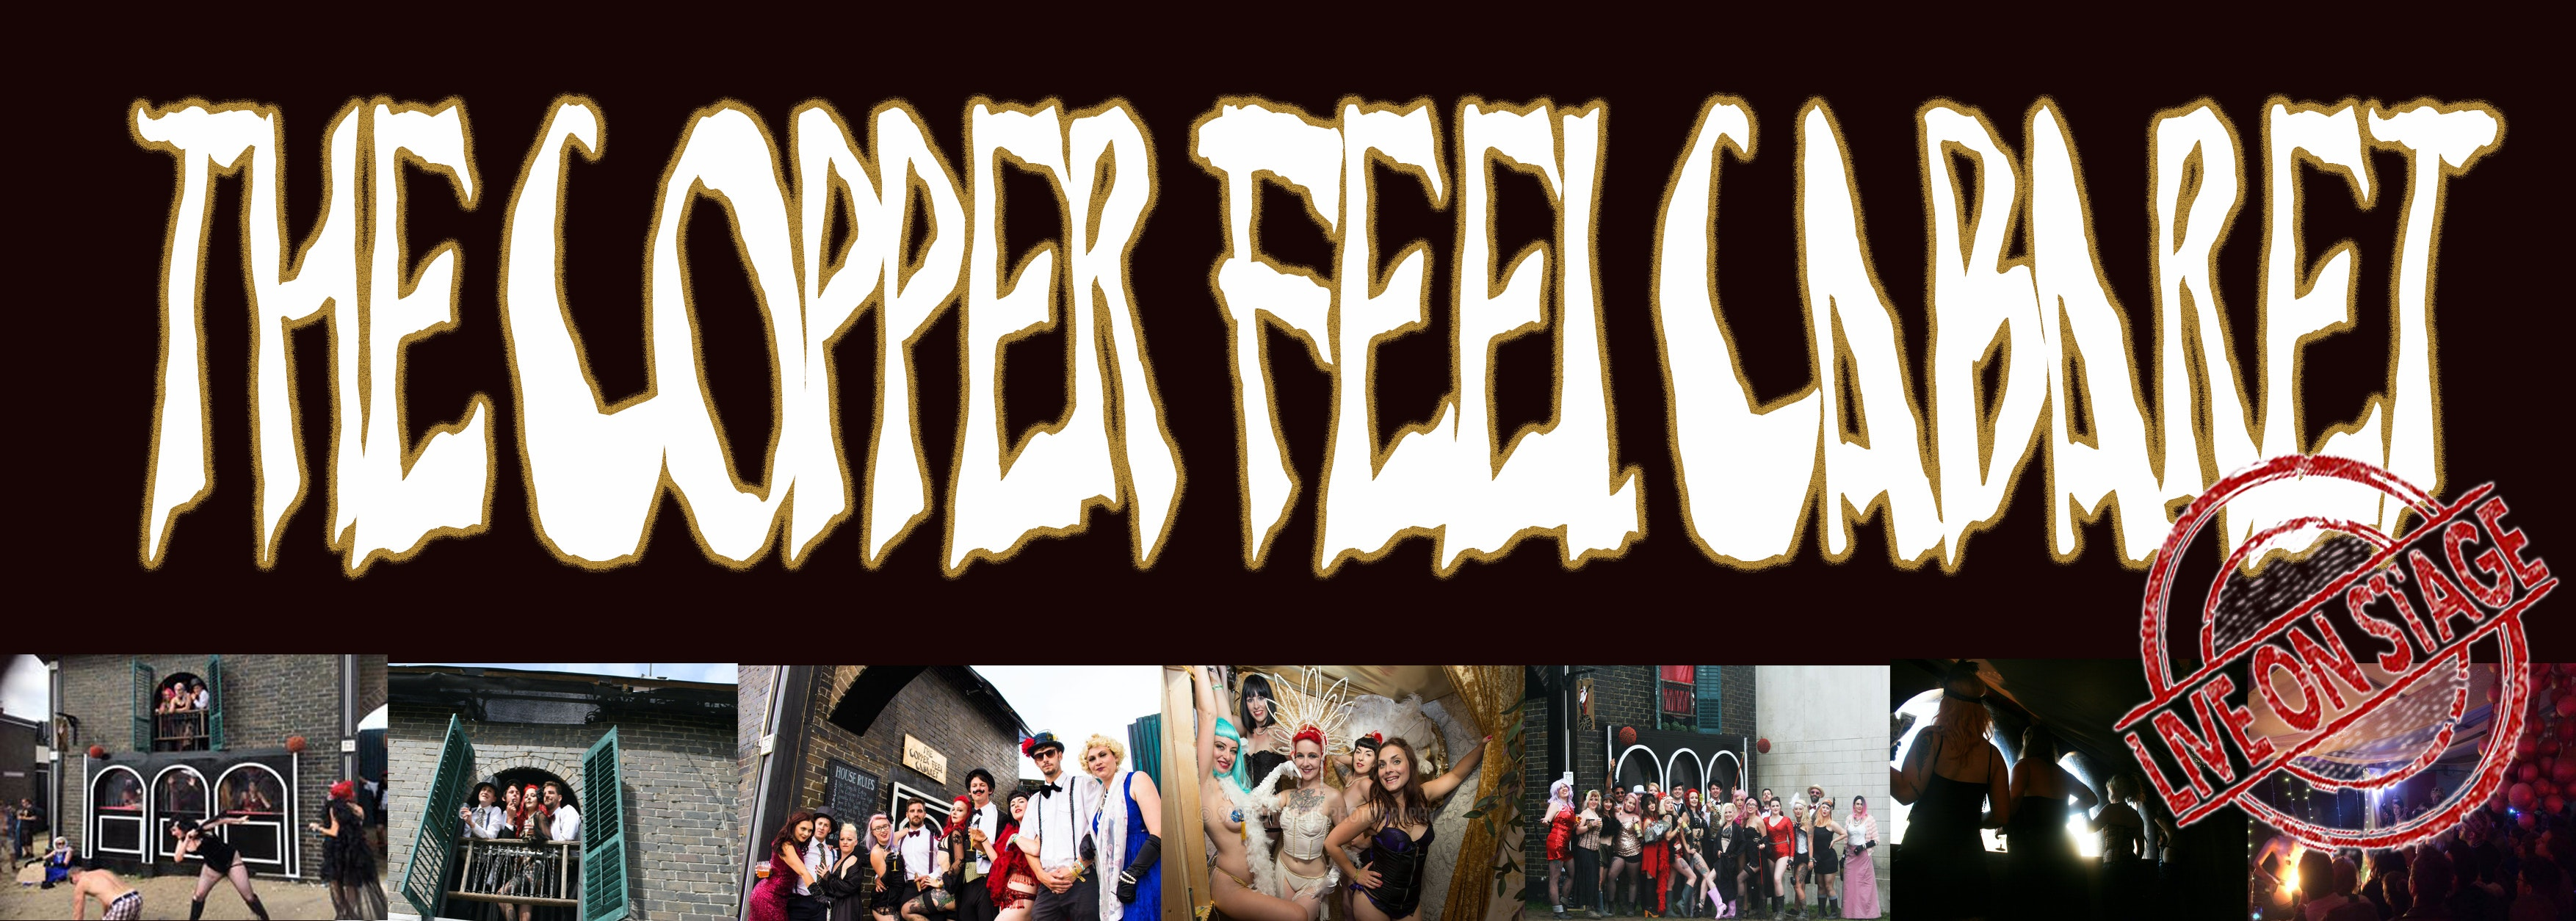 The Copper Feel Cabaret LIVE